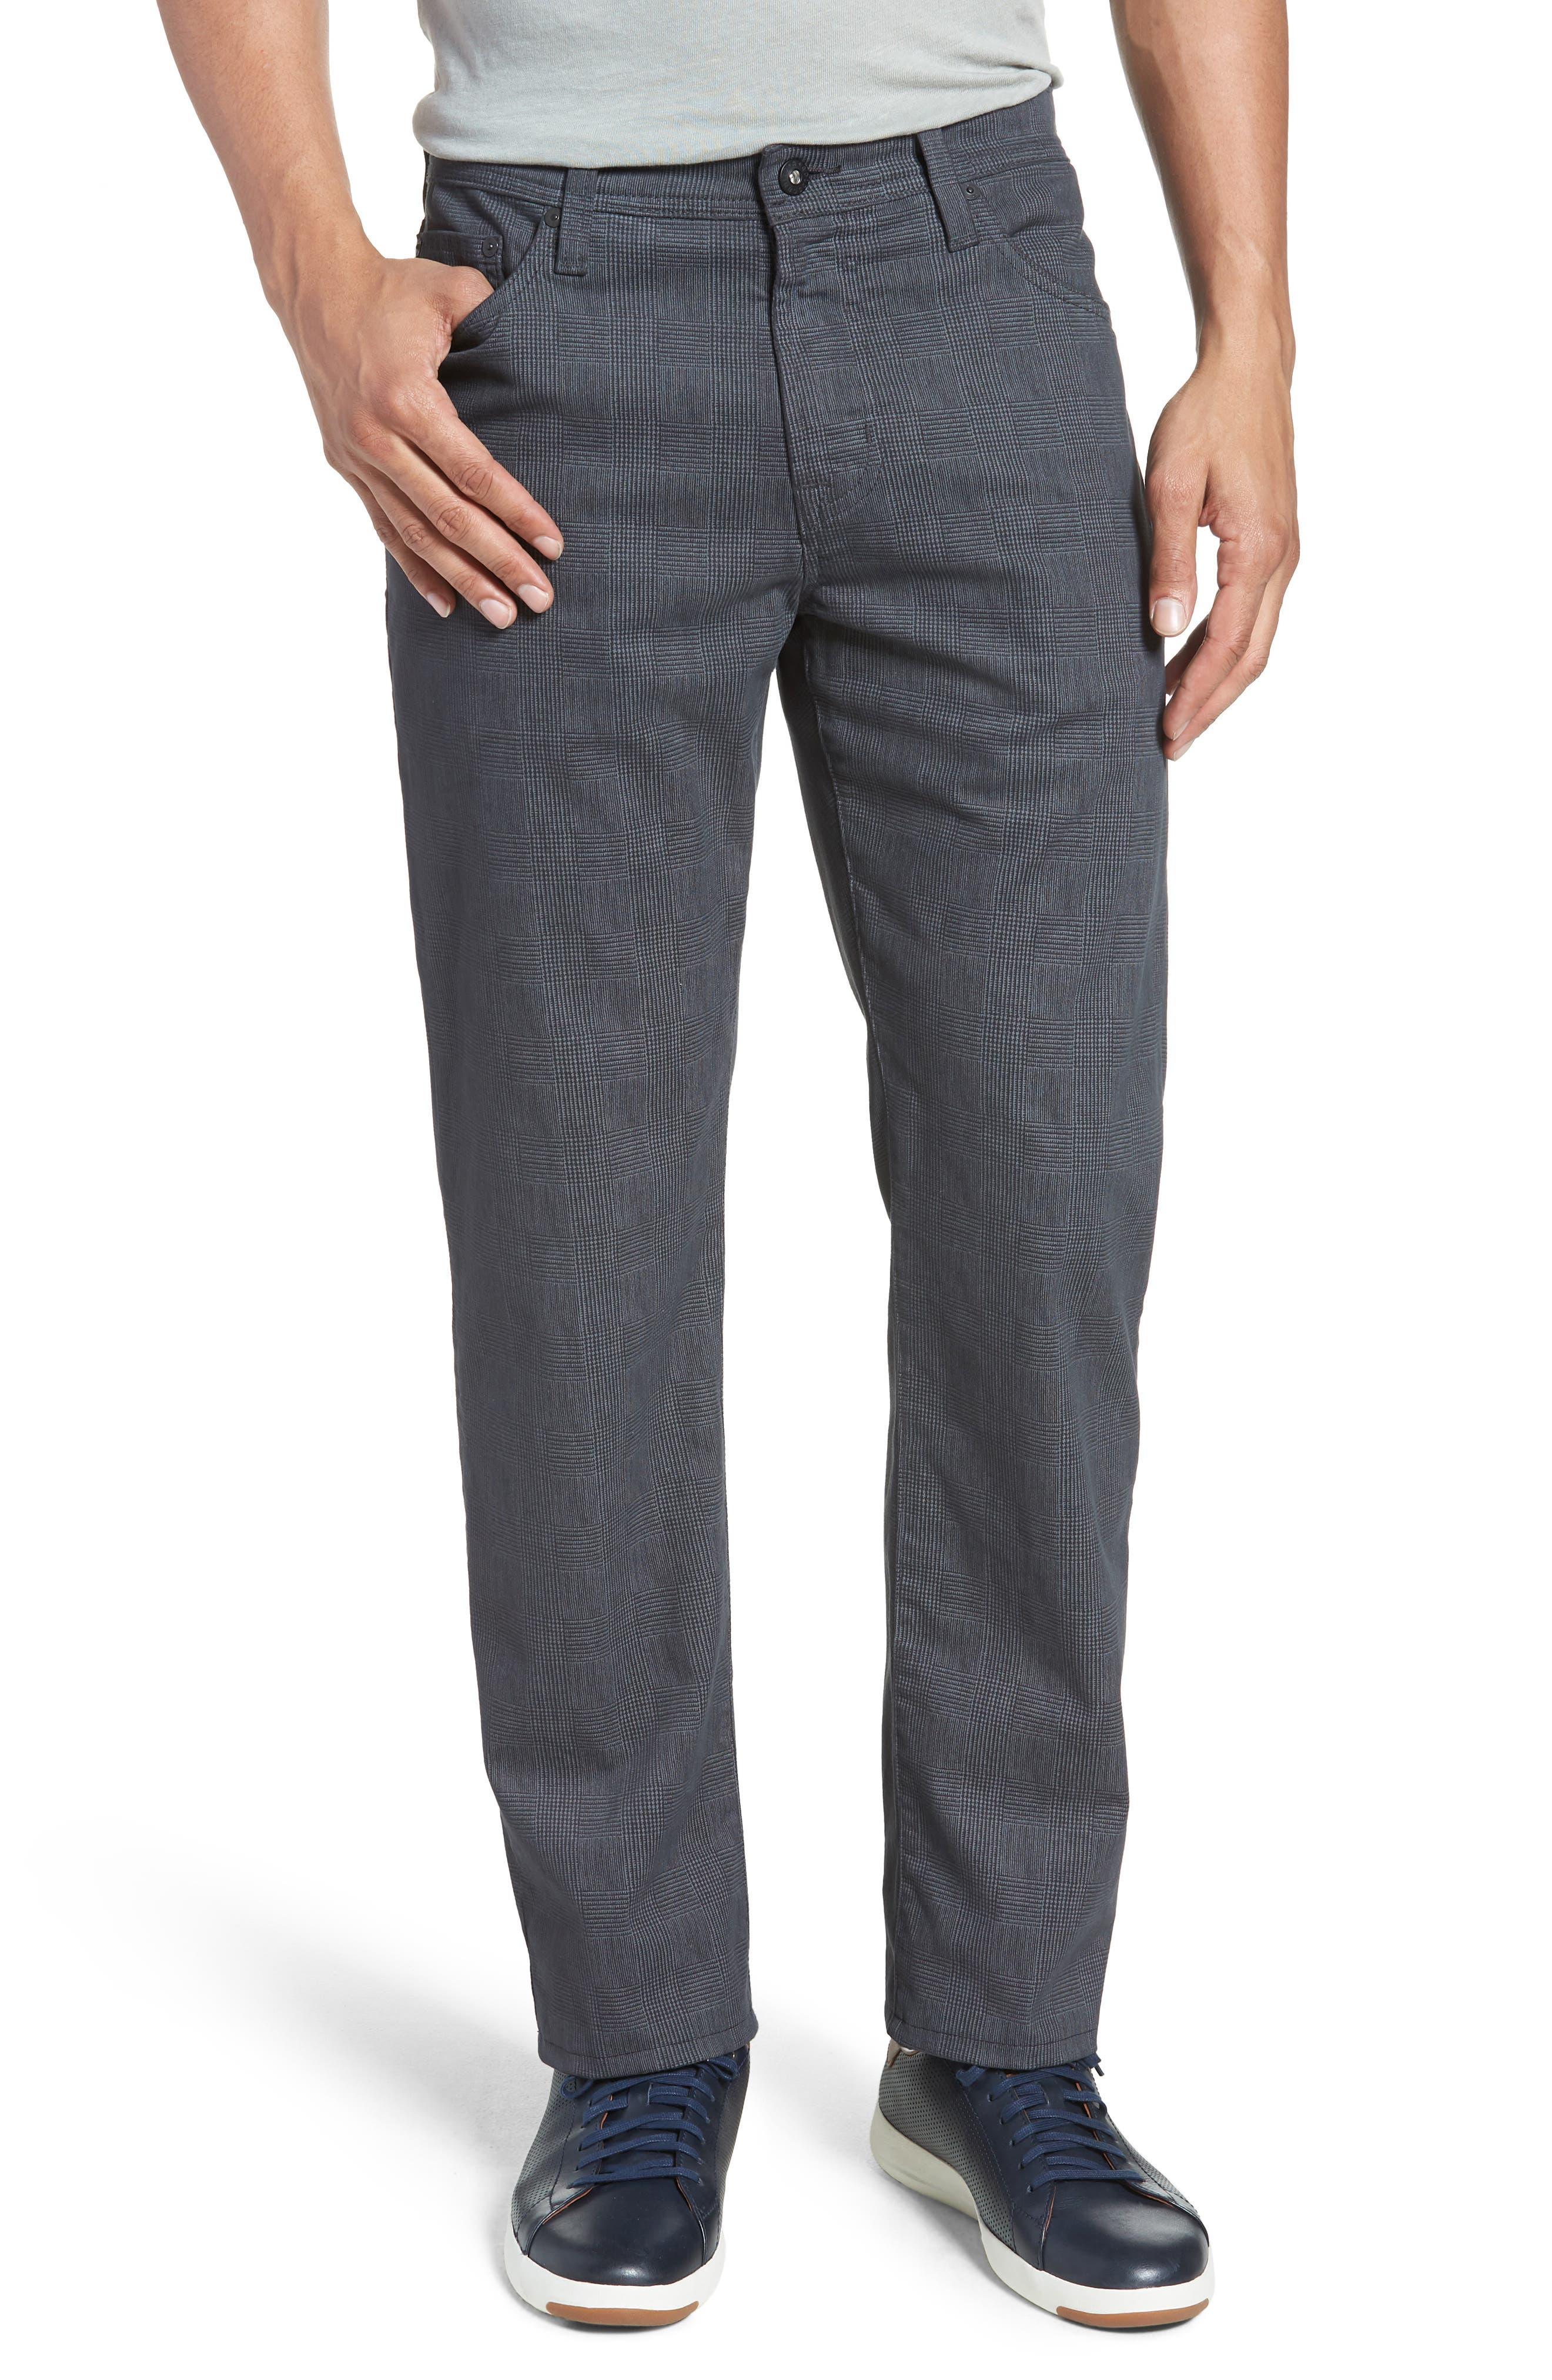 Everett SUD Print Slim Straight Leg Pants,                         Main,                         color, FINE PLAID GREY STONE